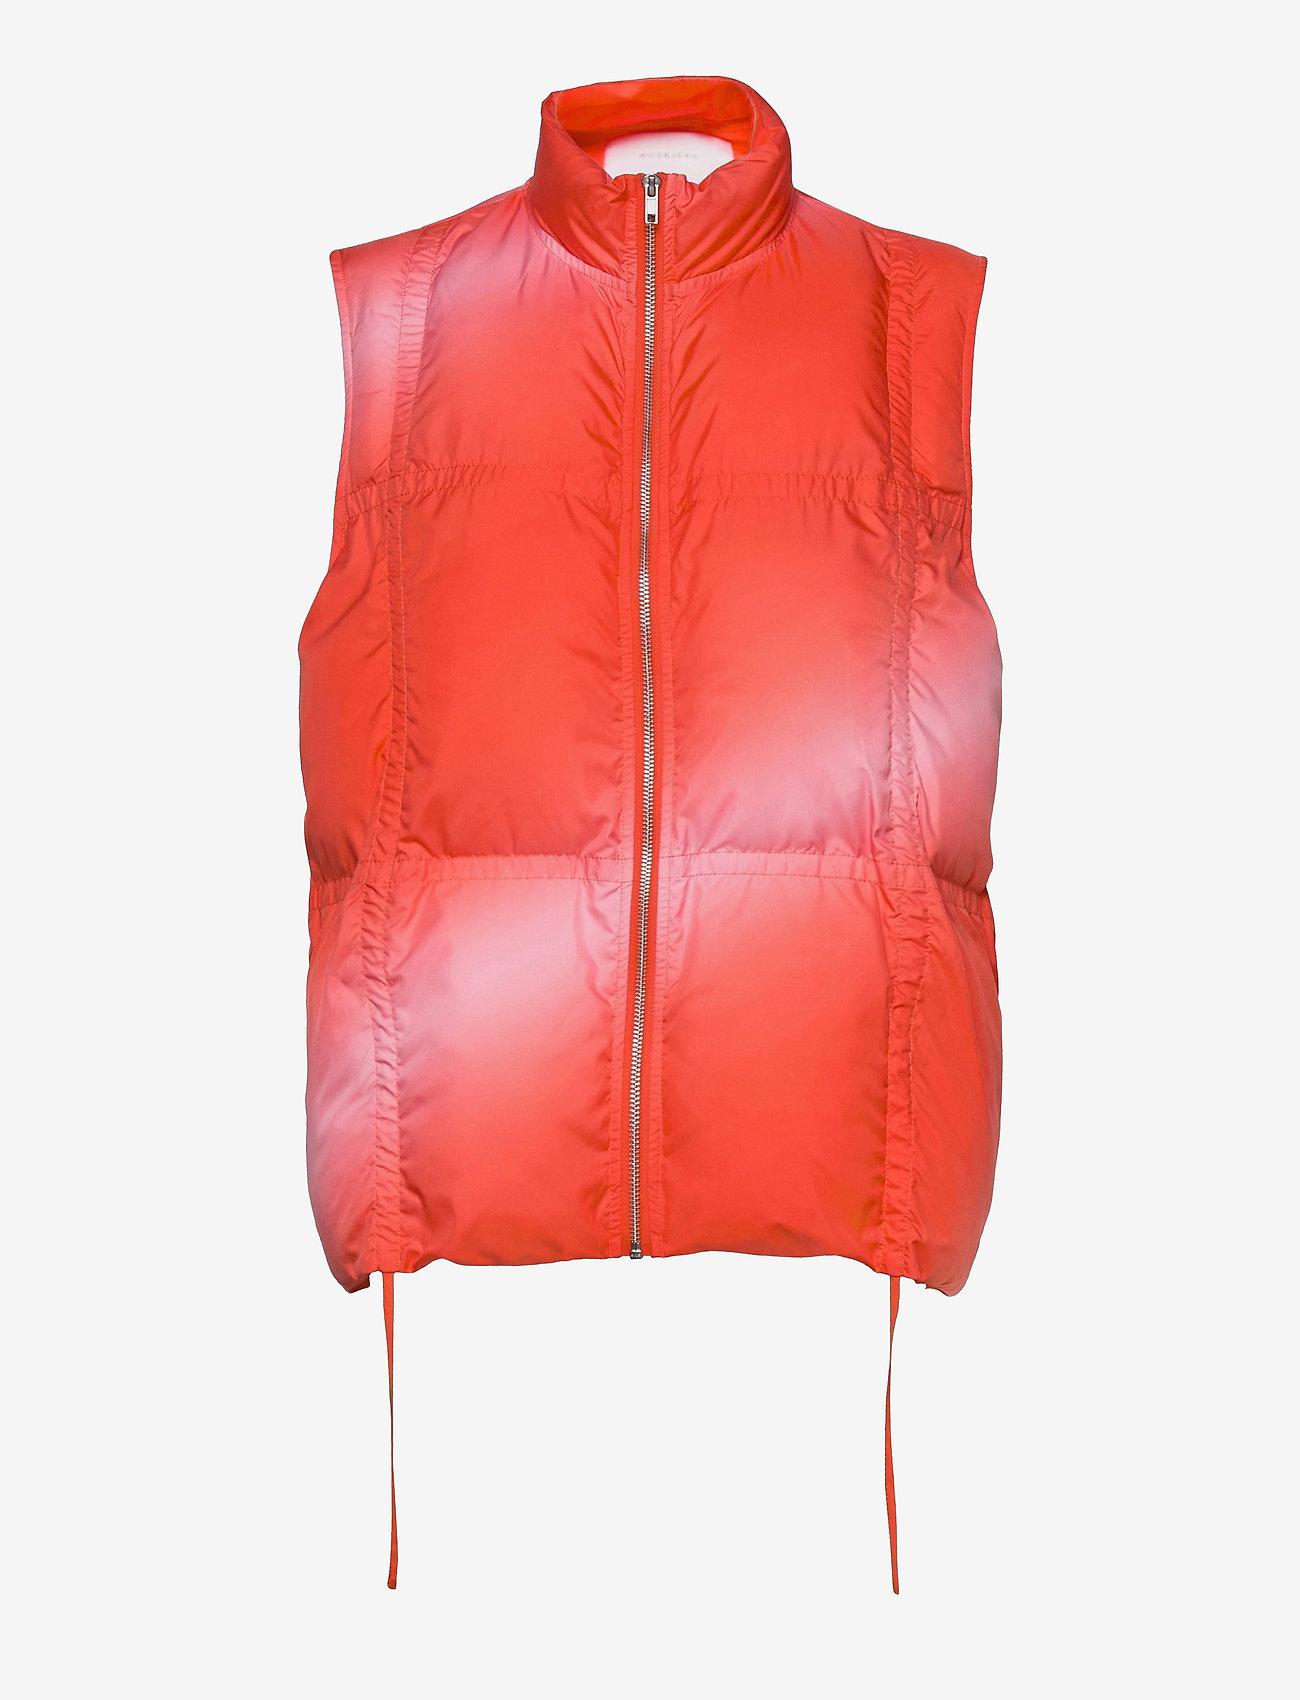 Hosbjerg - CATH DONNA TAMARA VEST - puffer vests - red fade - 0